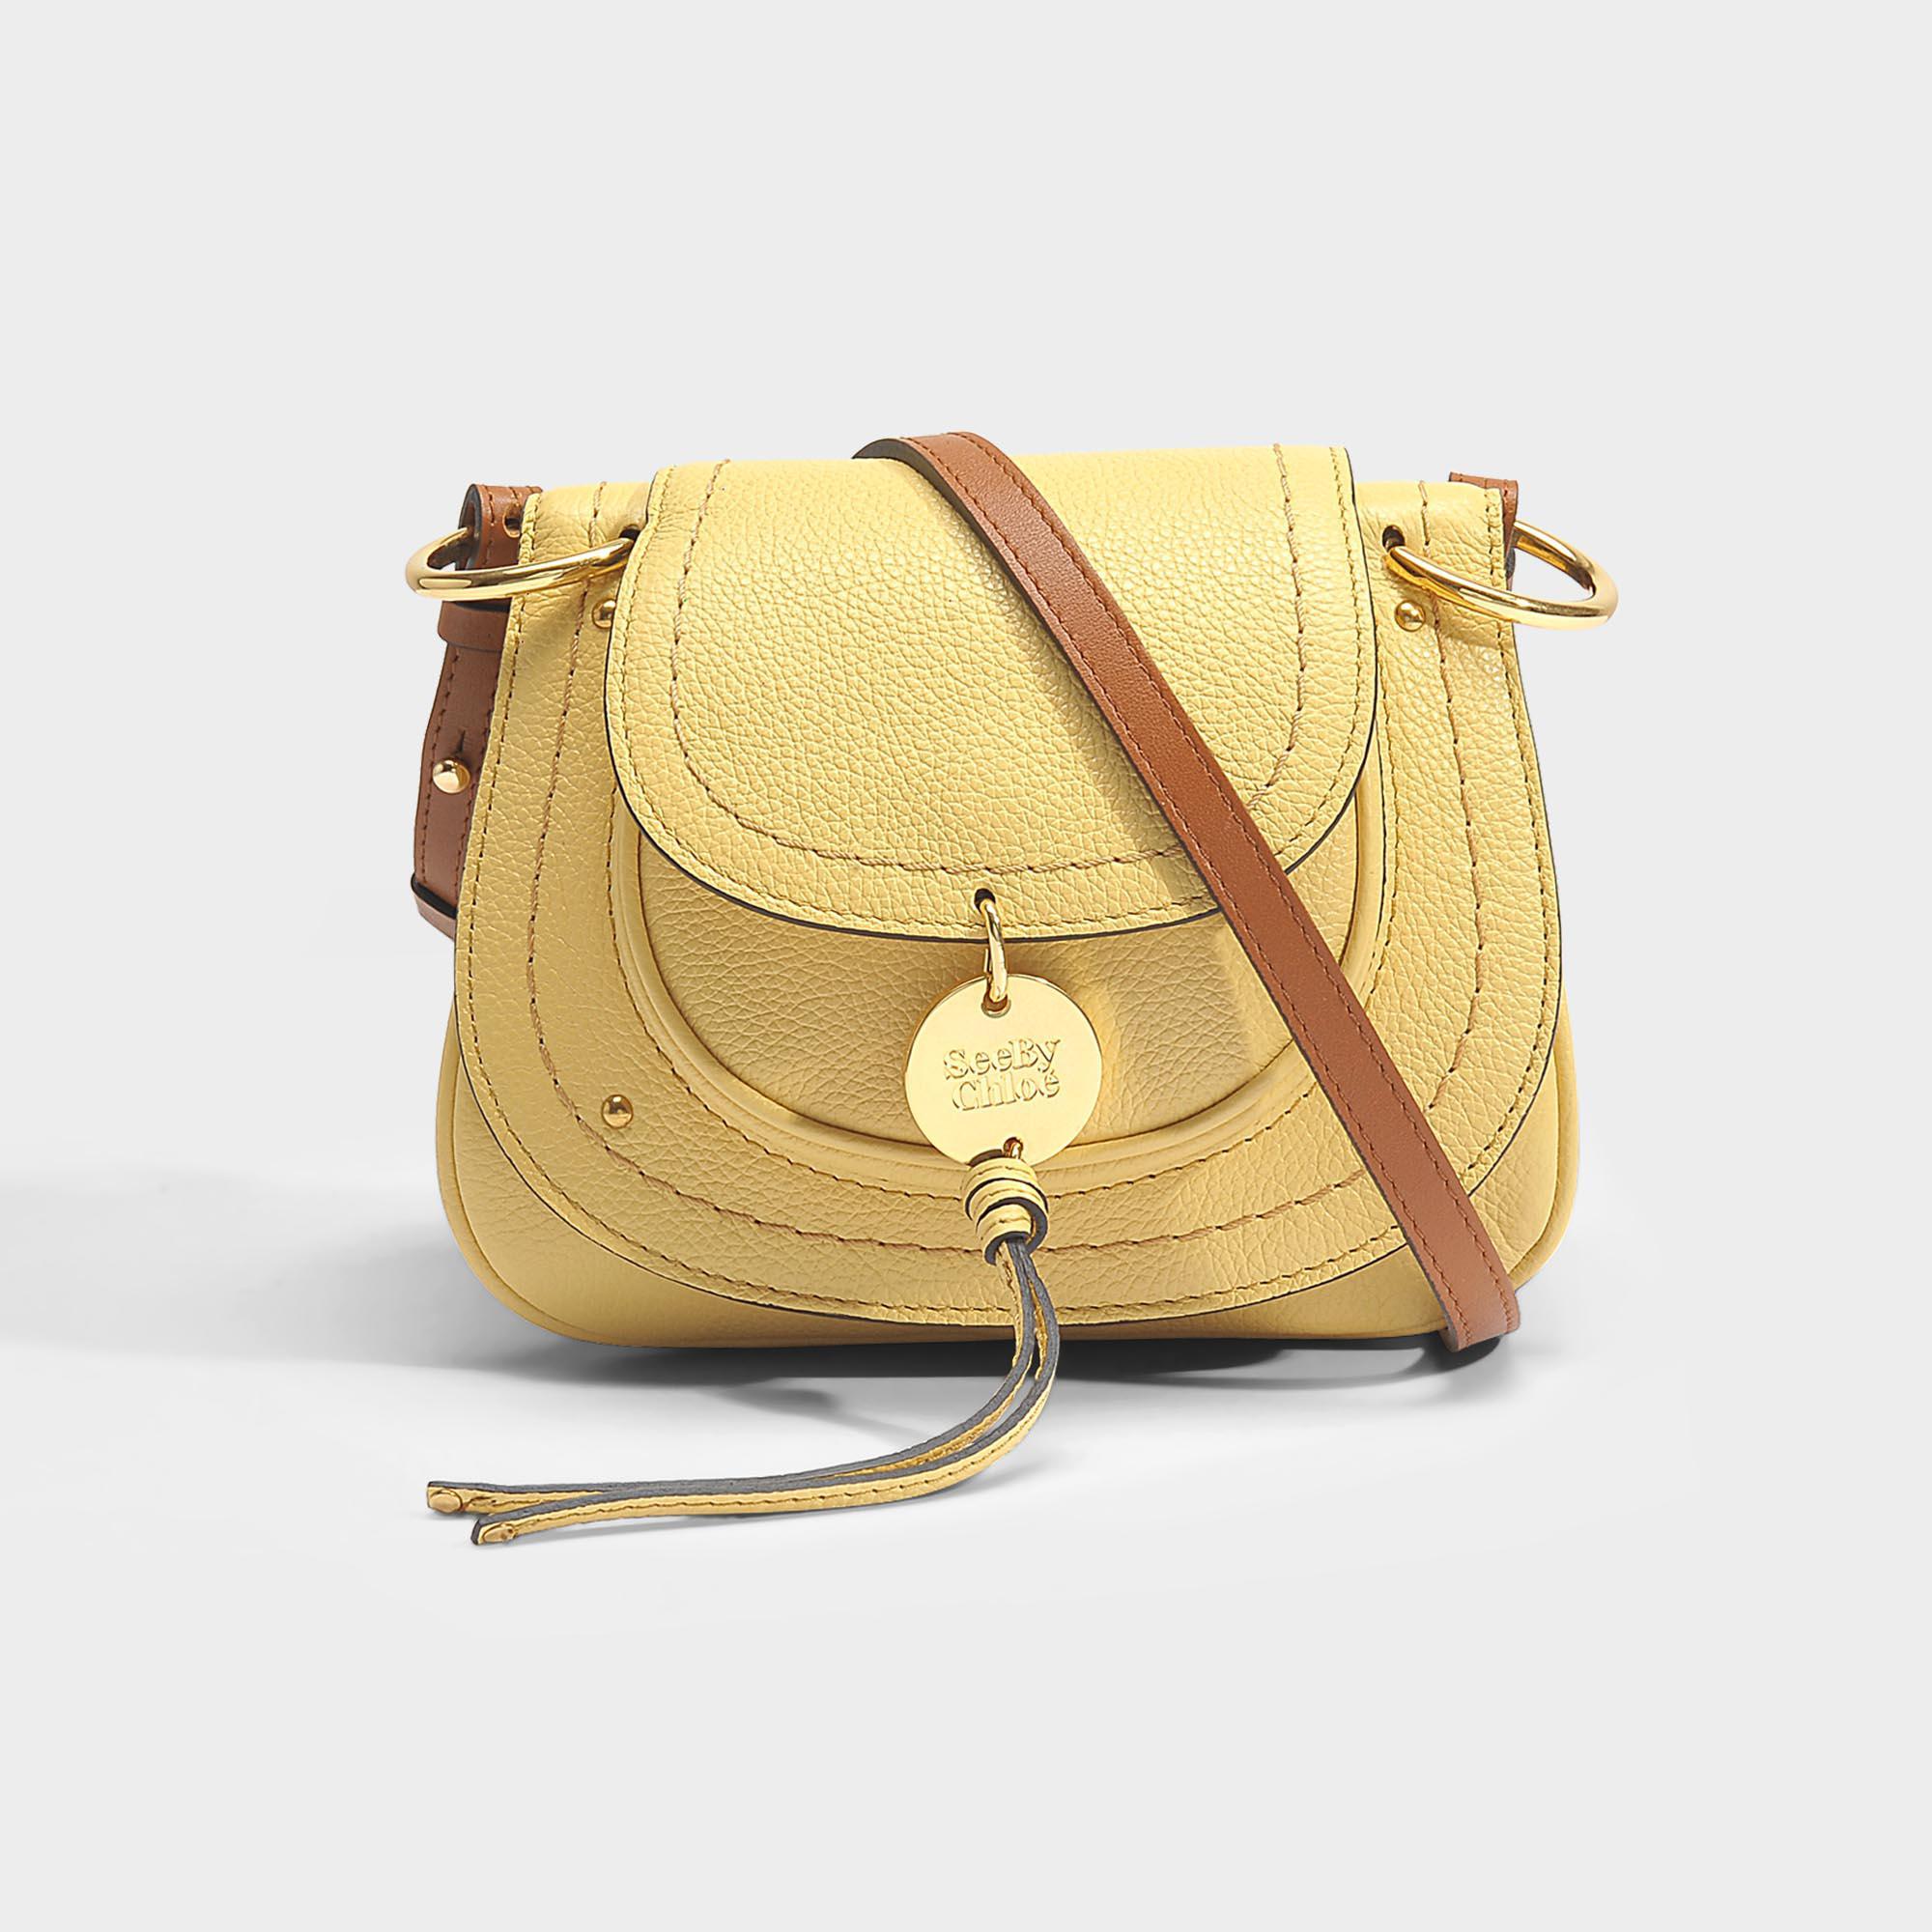 VIDA Leather Accent Tag - HOPE-Luggage by VIDA KmZdm